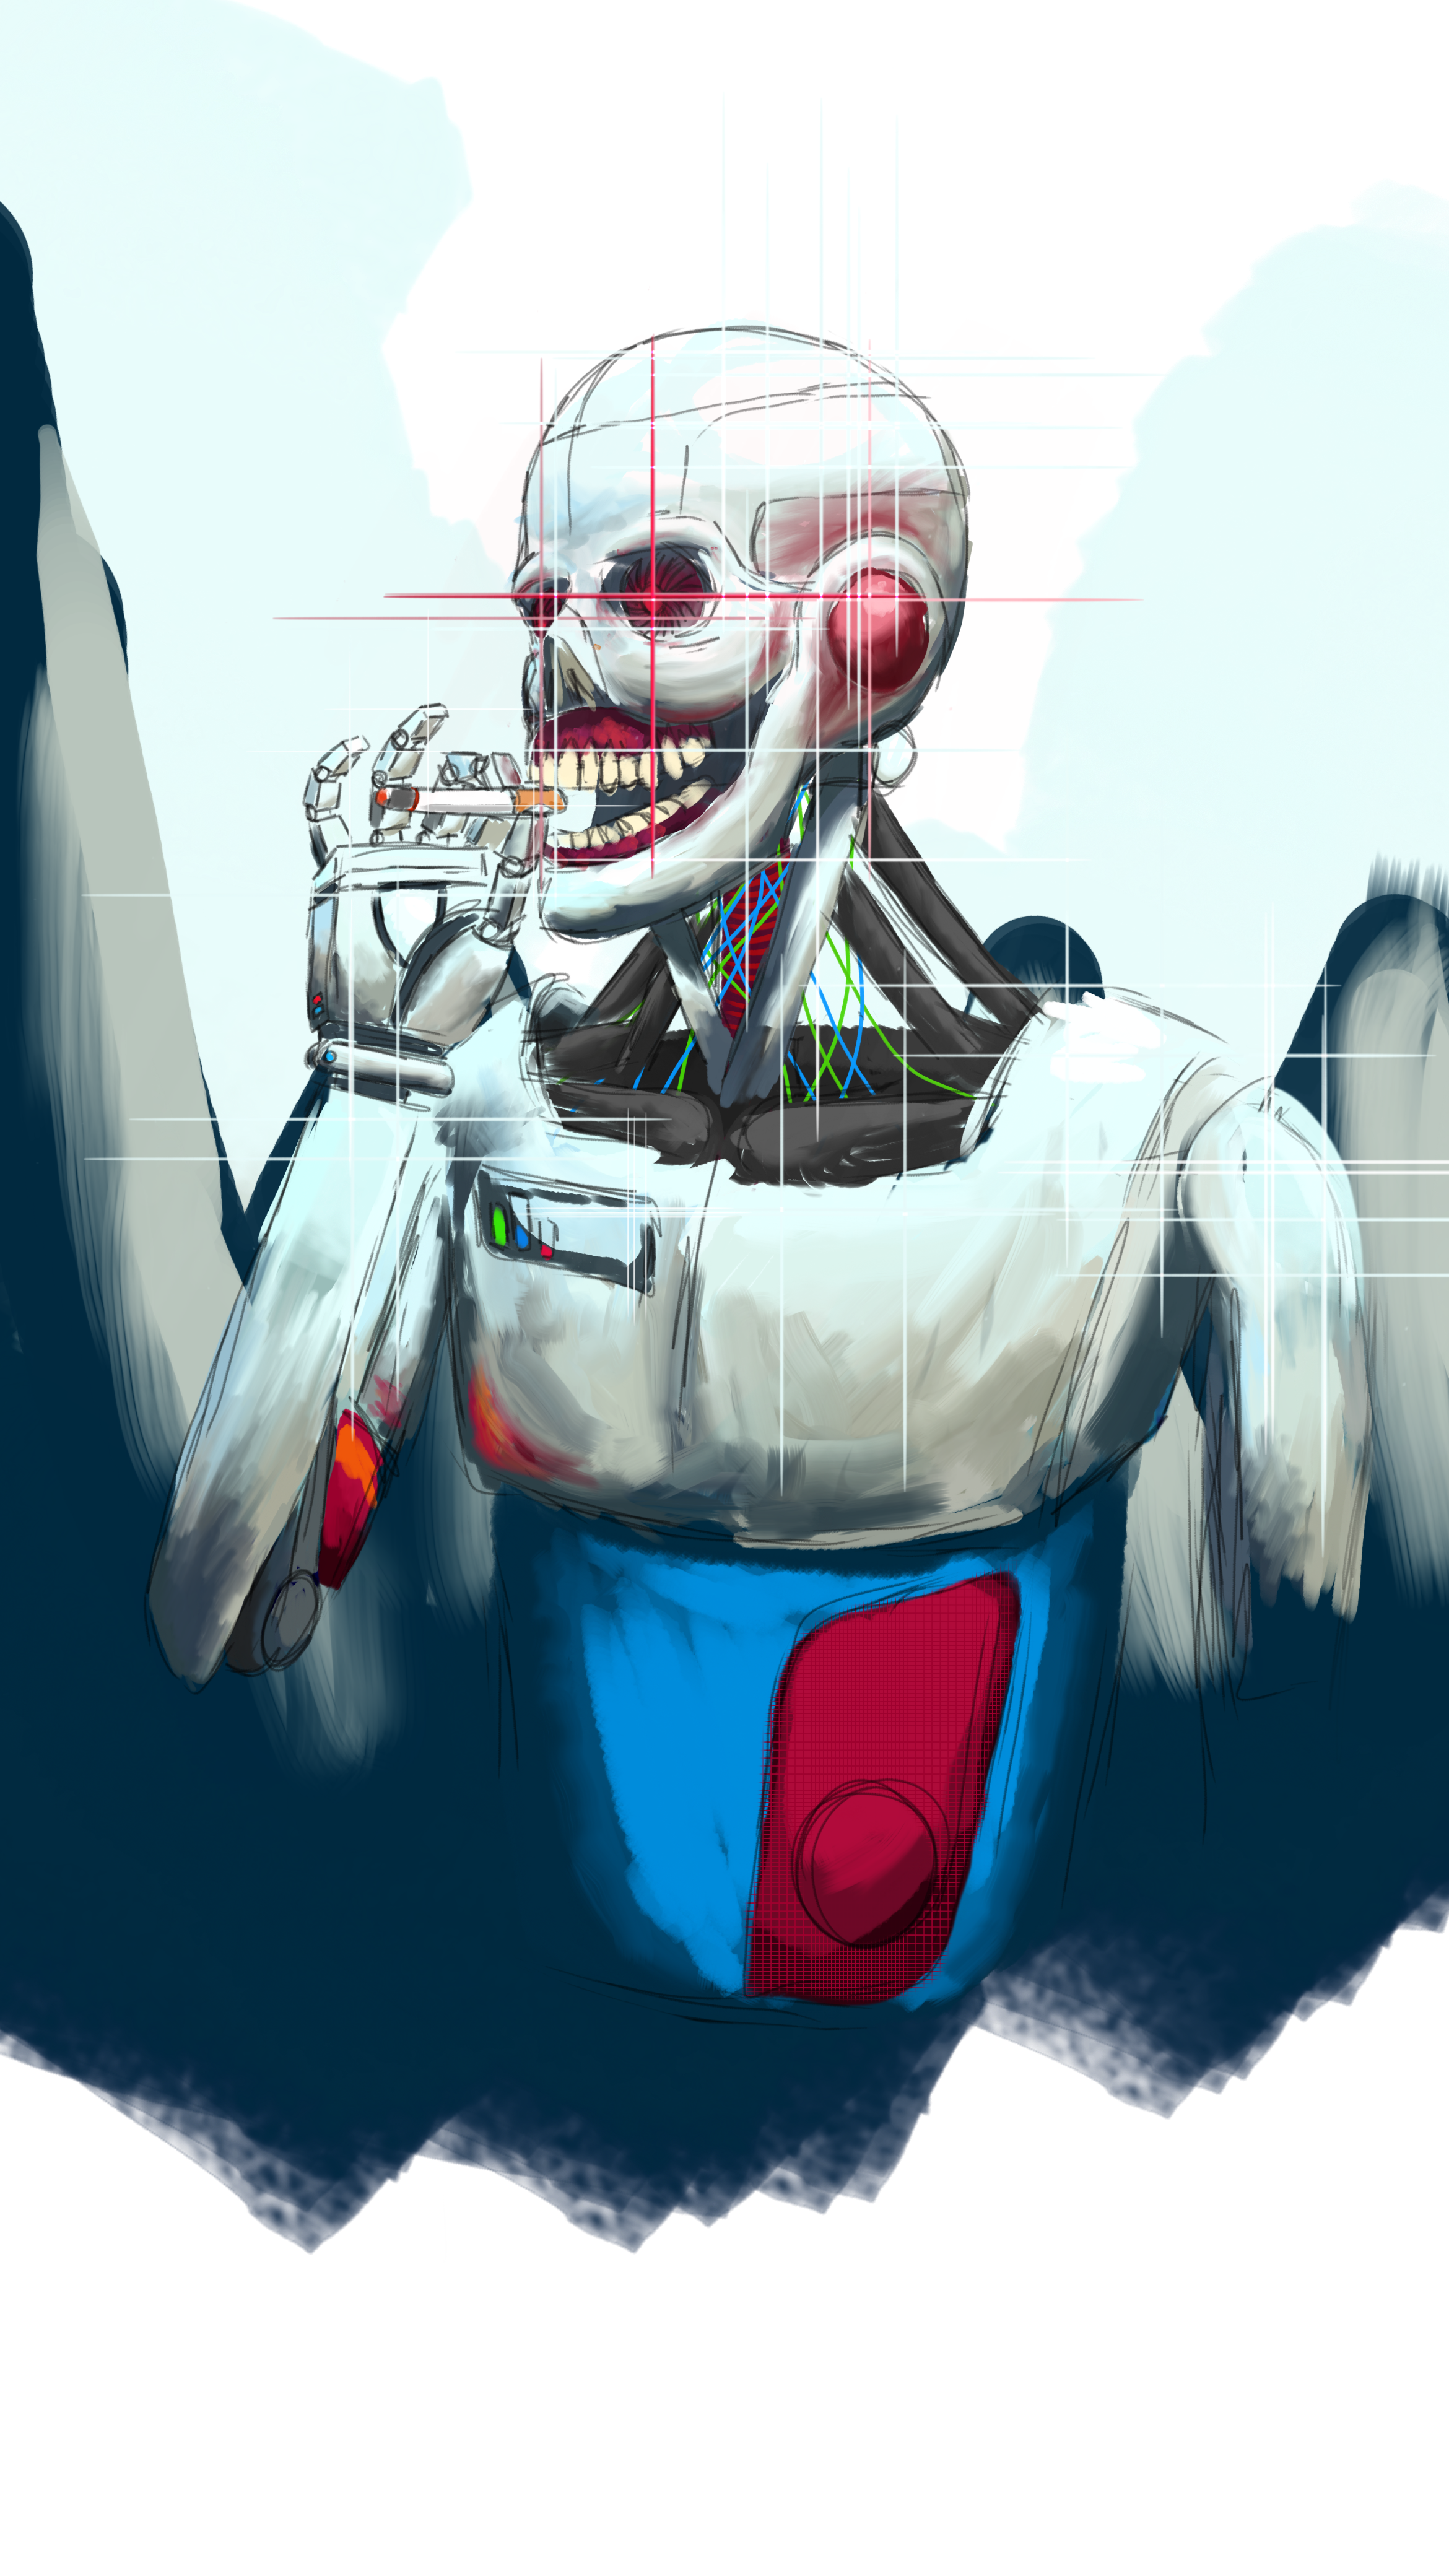 Digital Skeleton Skeleton, Me, Digital, 2019 Skeleton